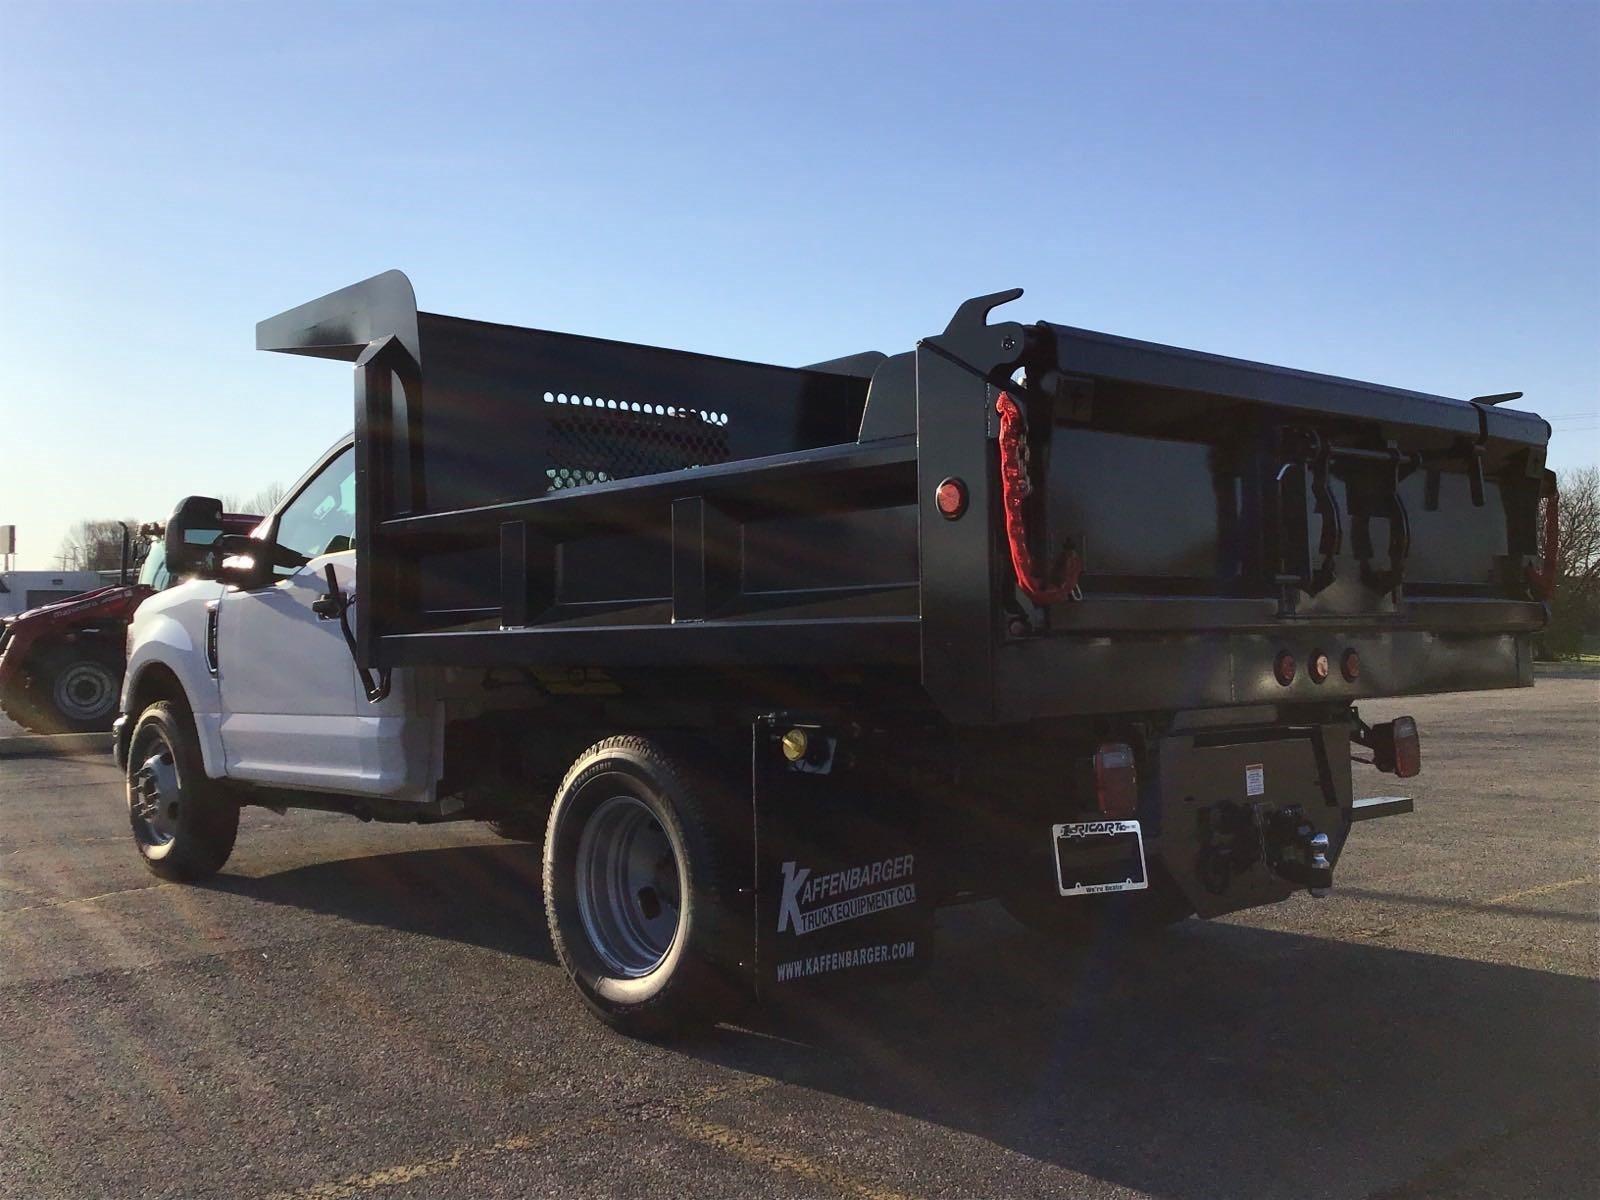 2020 Ford F-350 Regular Cab DRW 4x2, Rowe Truck Equipment Dump Body #FTL1592 - photo 1